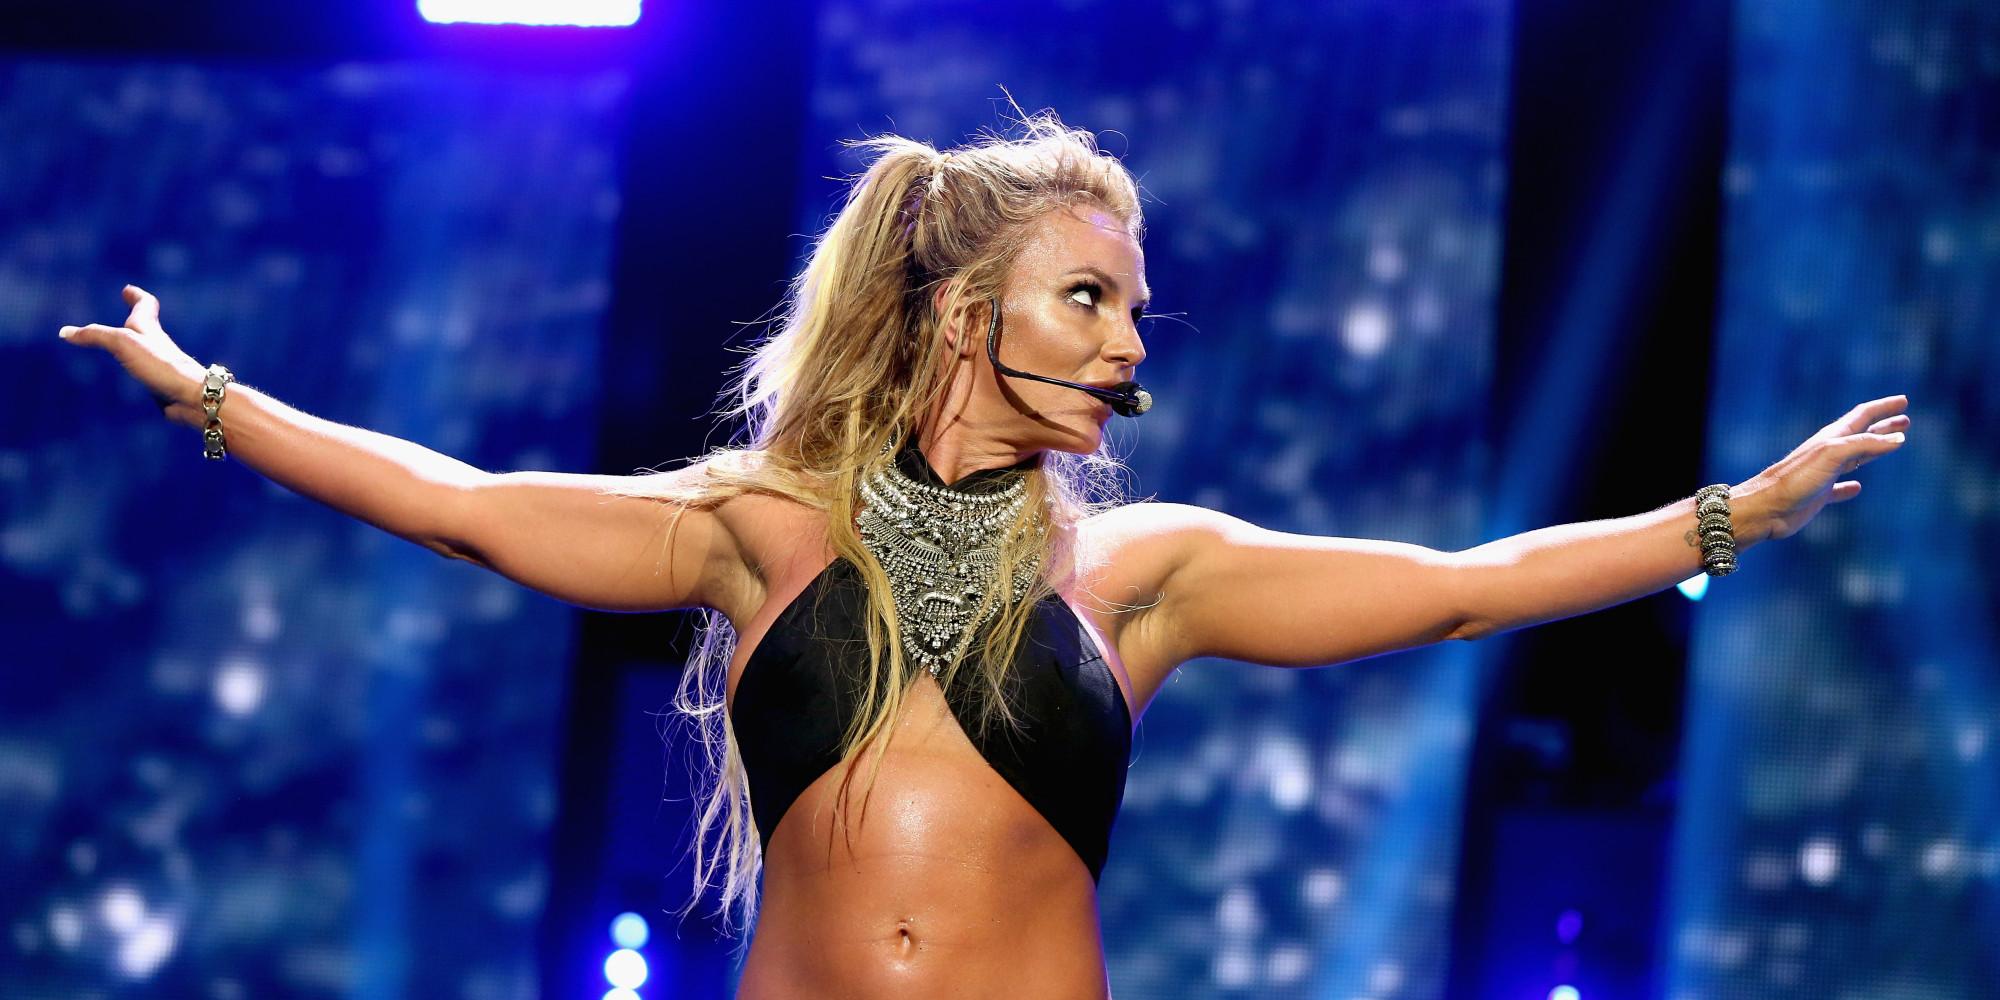 Britney Spears pussy - 31 Bilder - xHamstercom